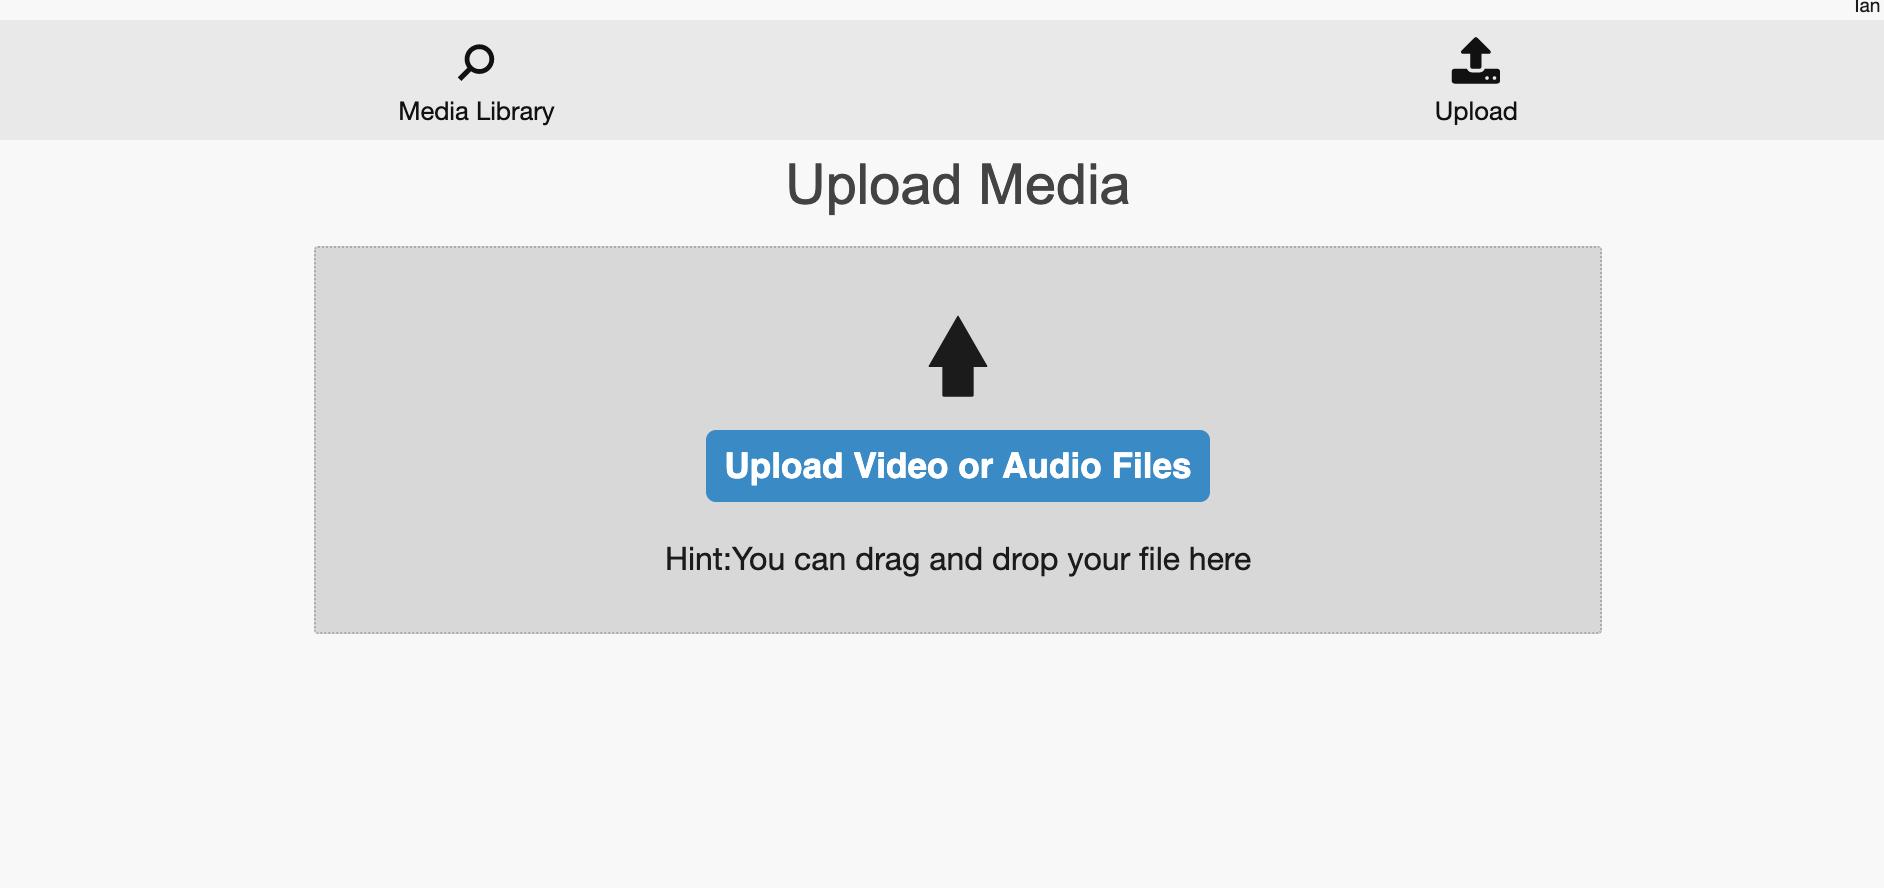 Moodle forum - upload video/audio files